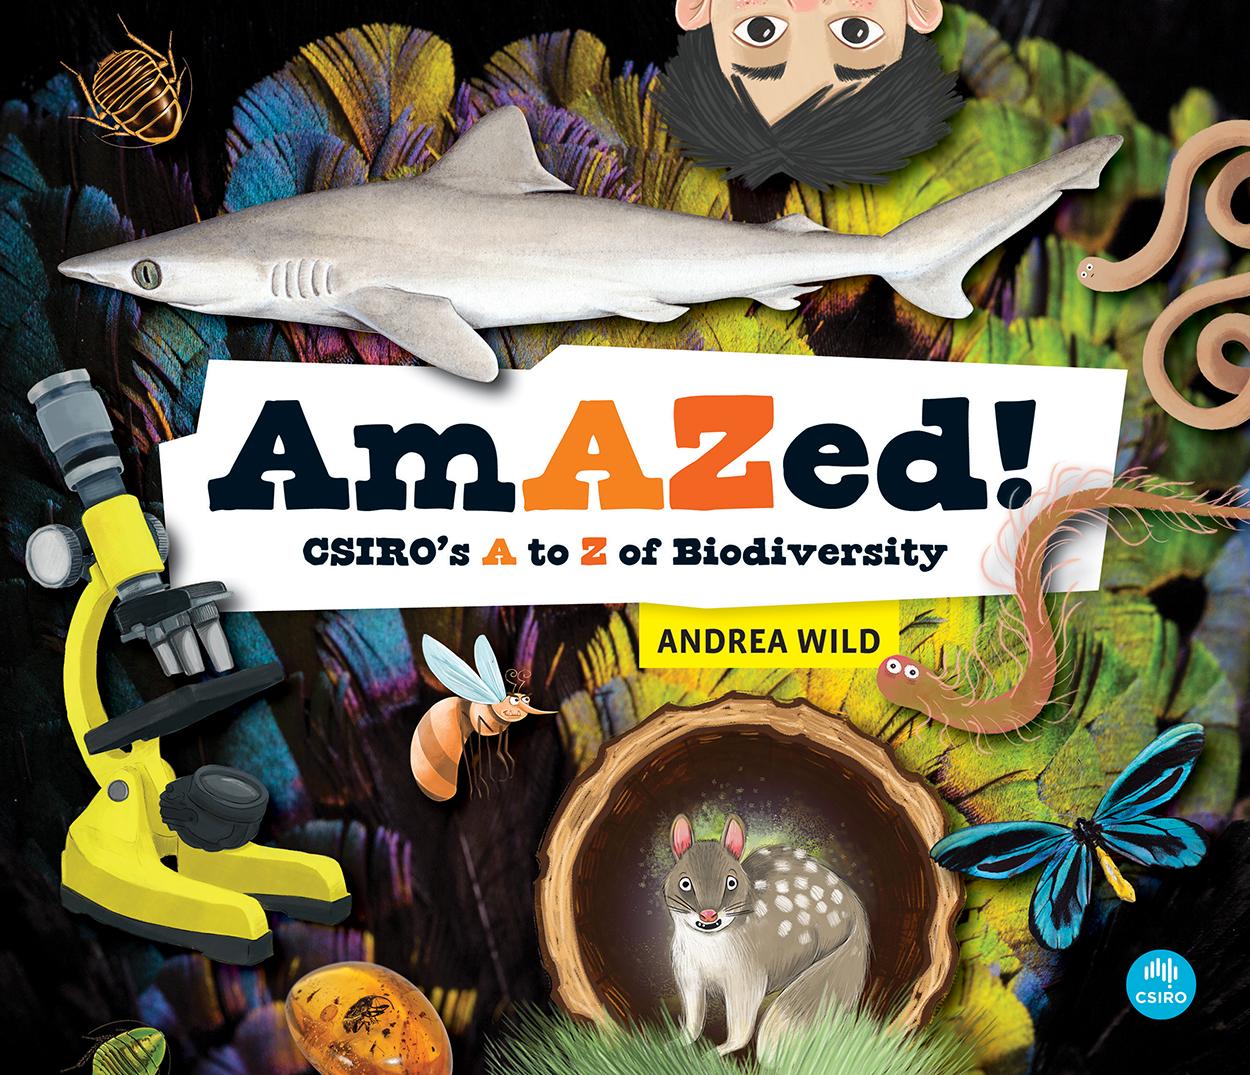 AmAZed! CSIRO's A to Z of Biodiversity